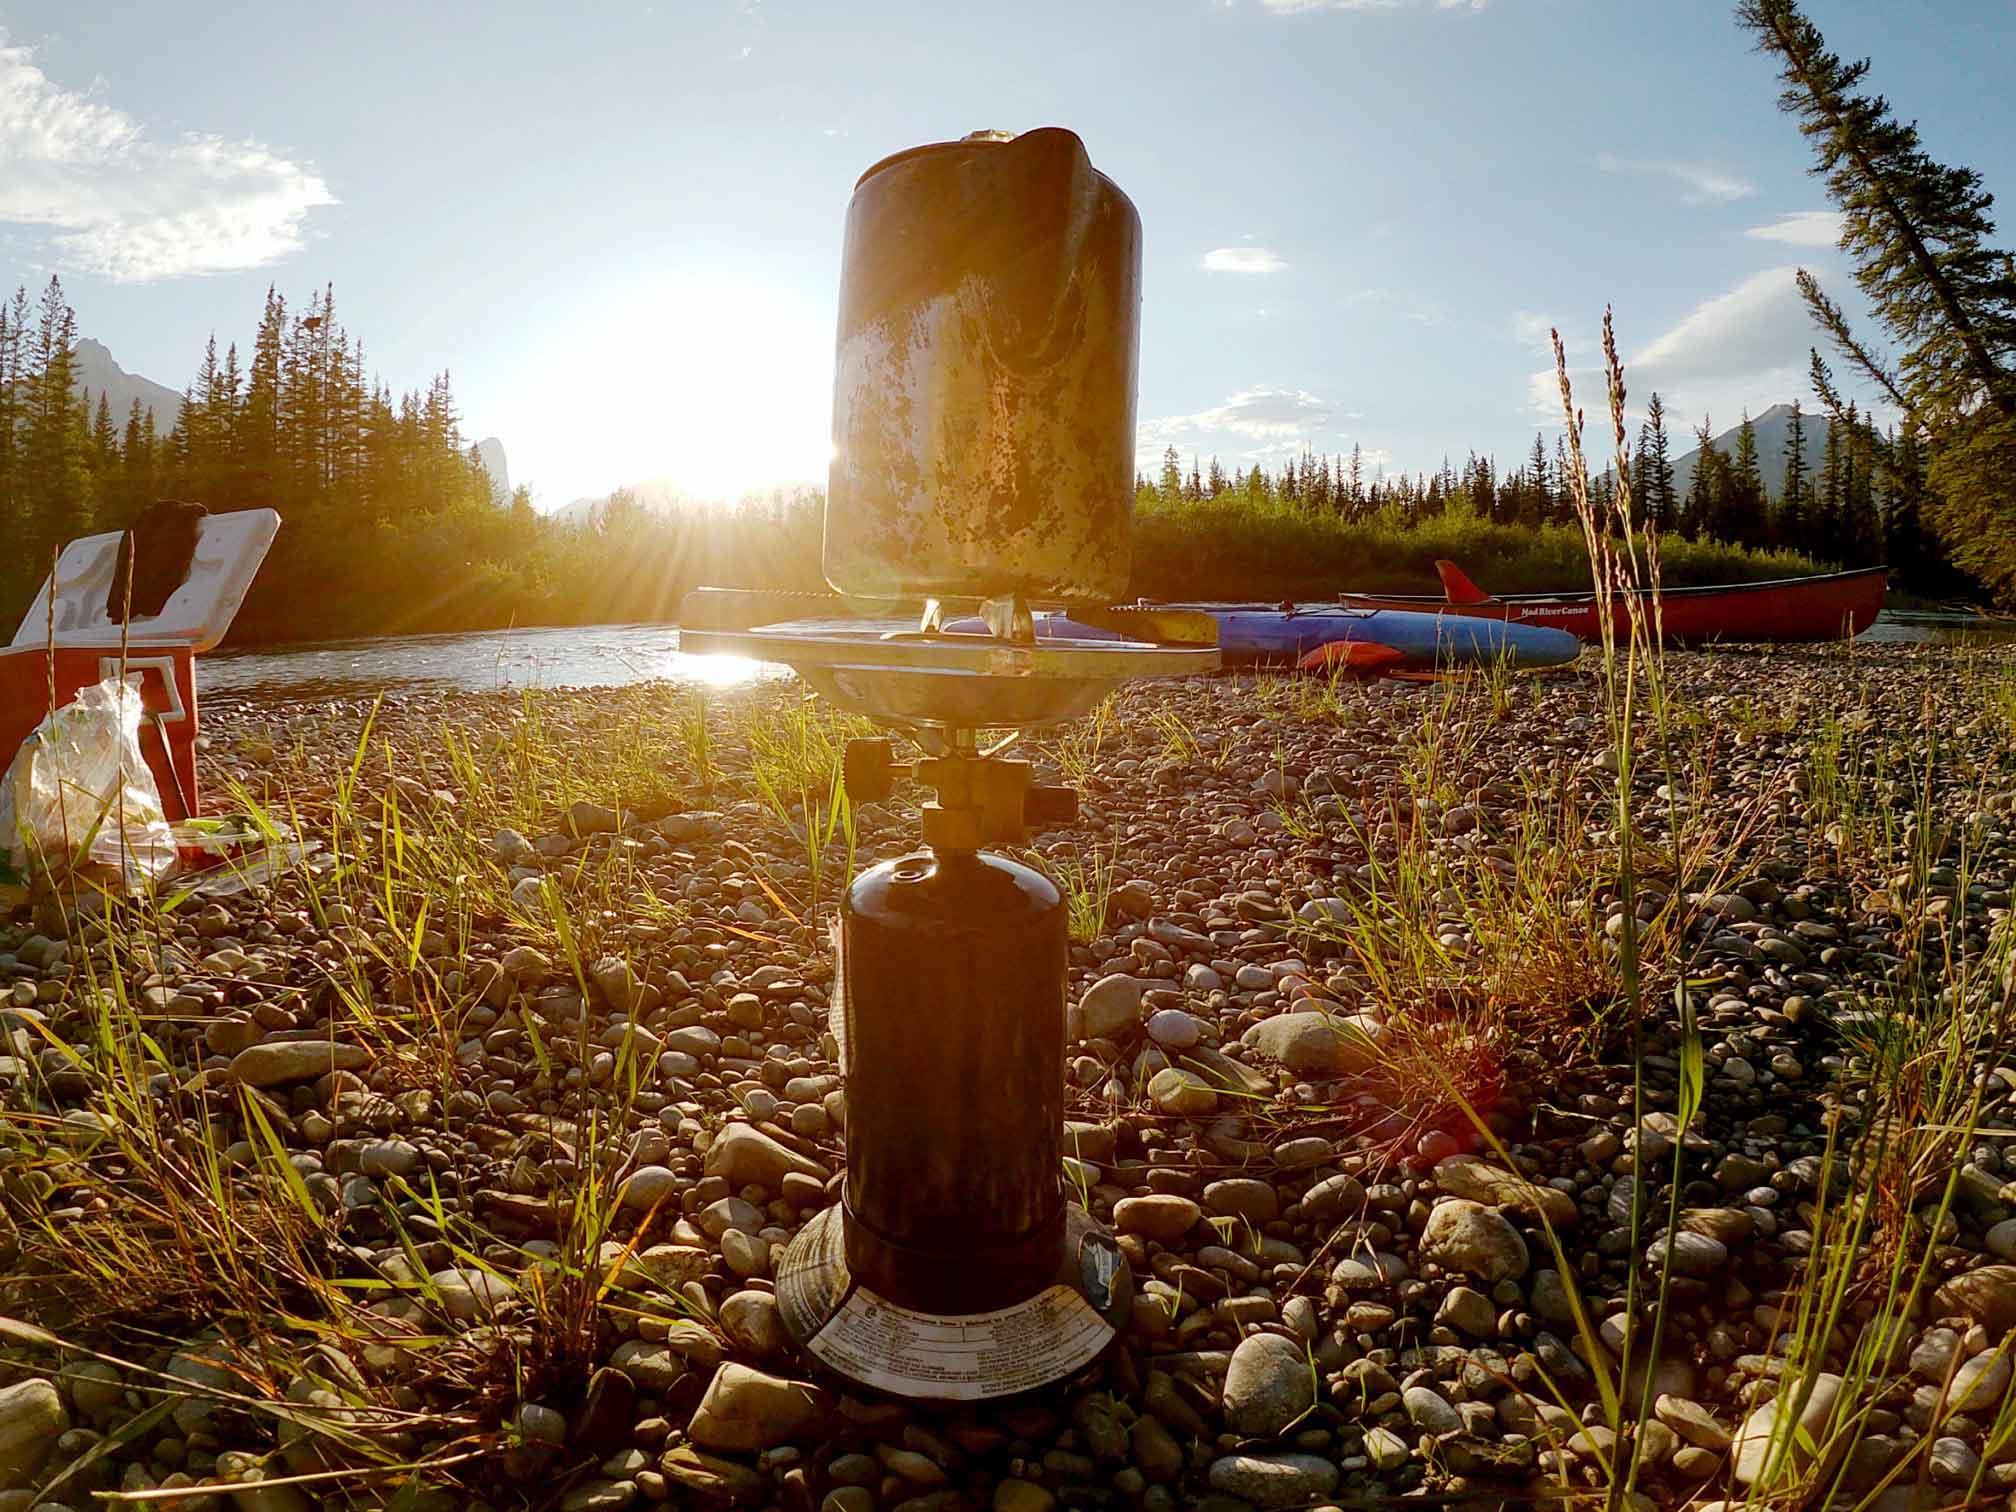 A propane camping stove